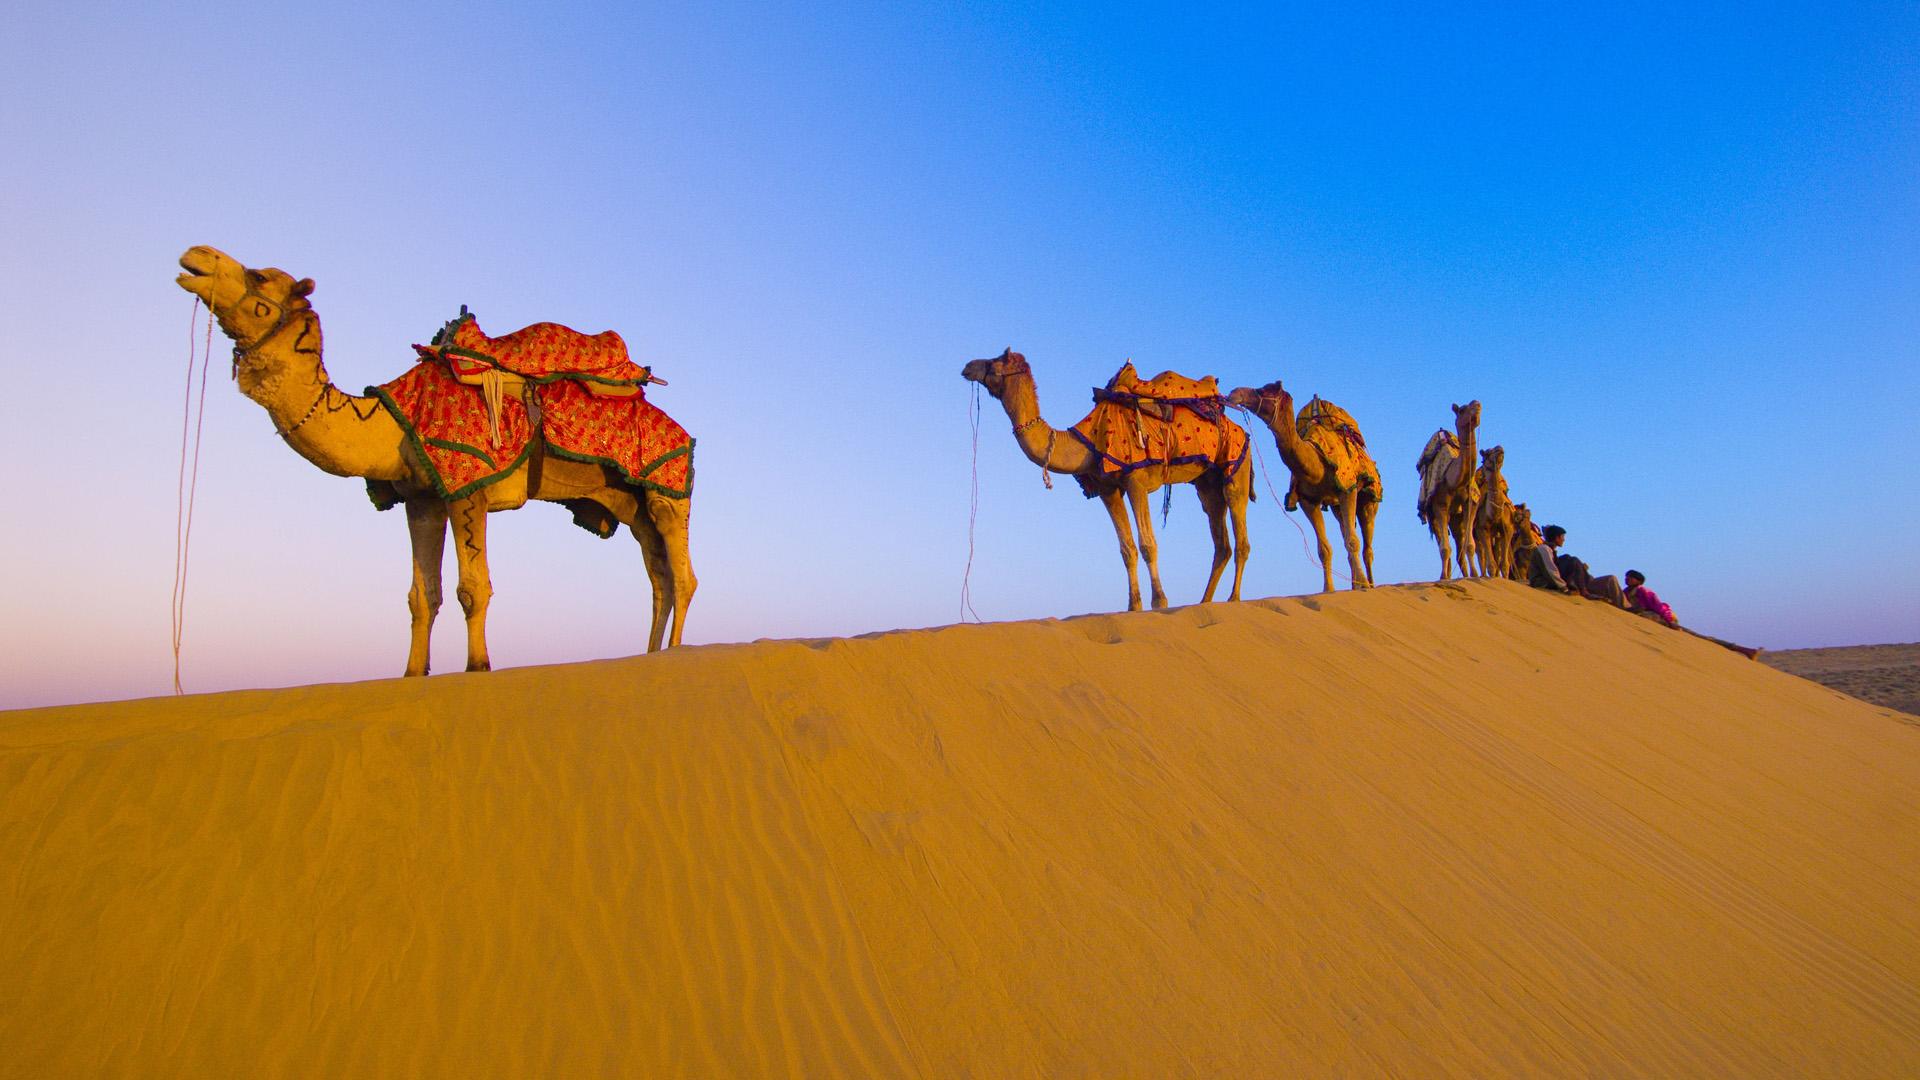 Camel Wide wallpapers